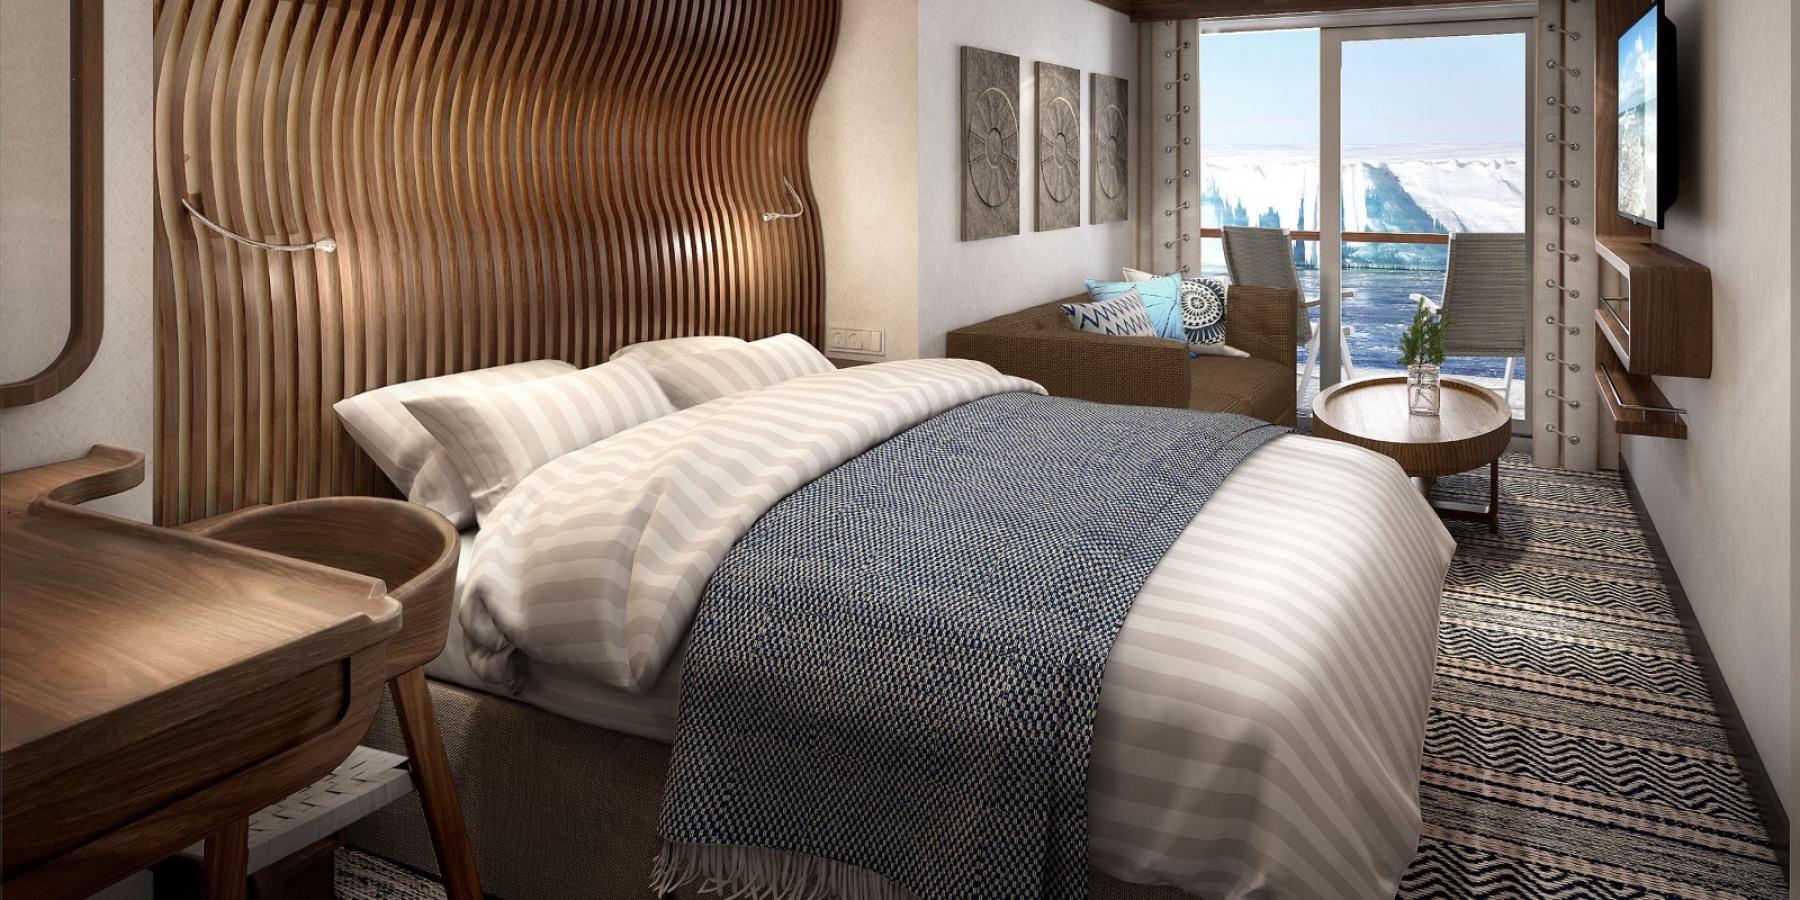 Hurtigruten MS Roald Amundsen Accommodation Balcony Stateroom.jpg